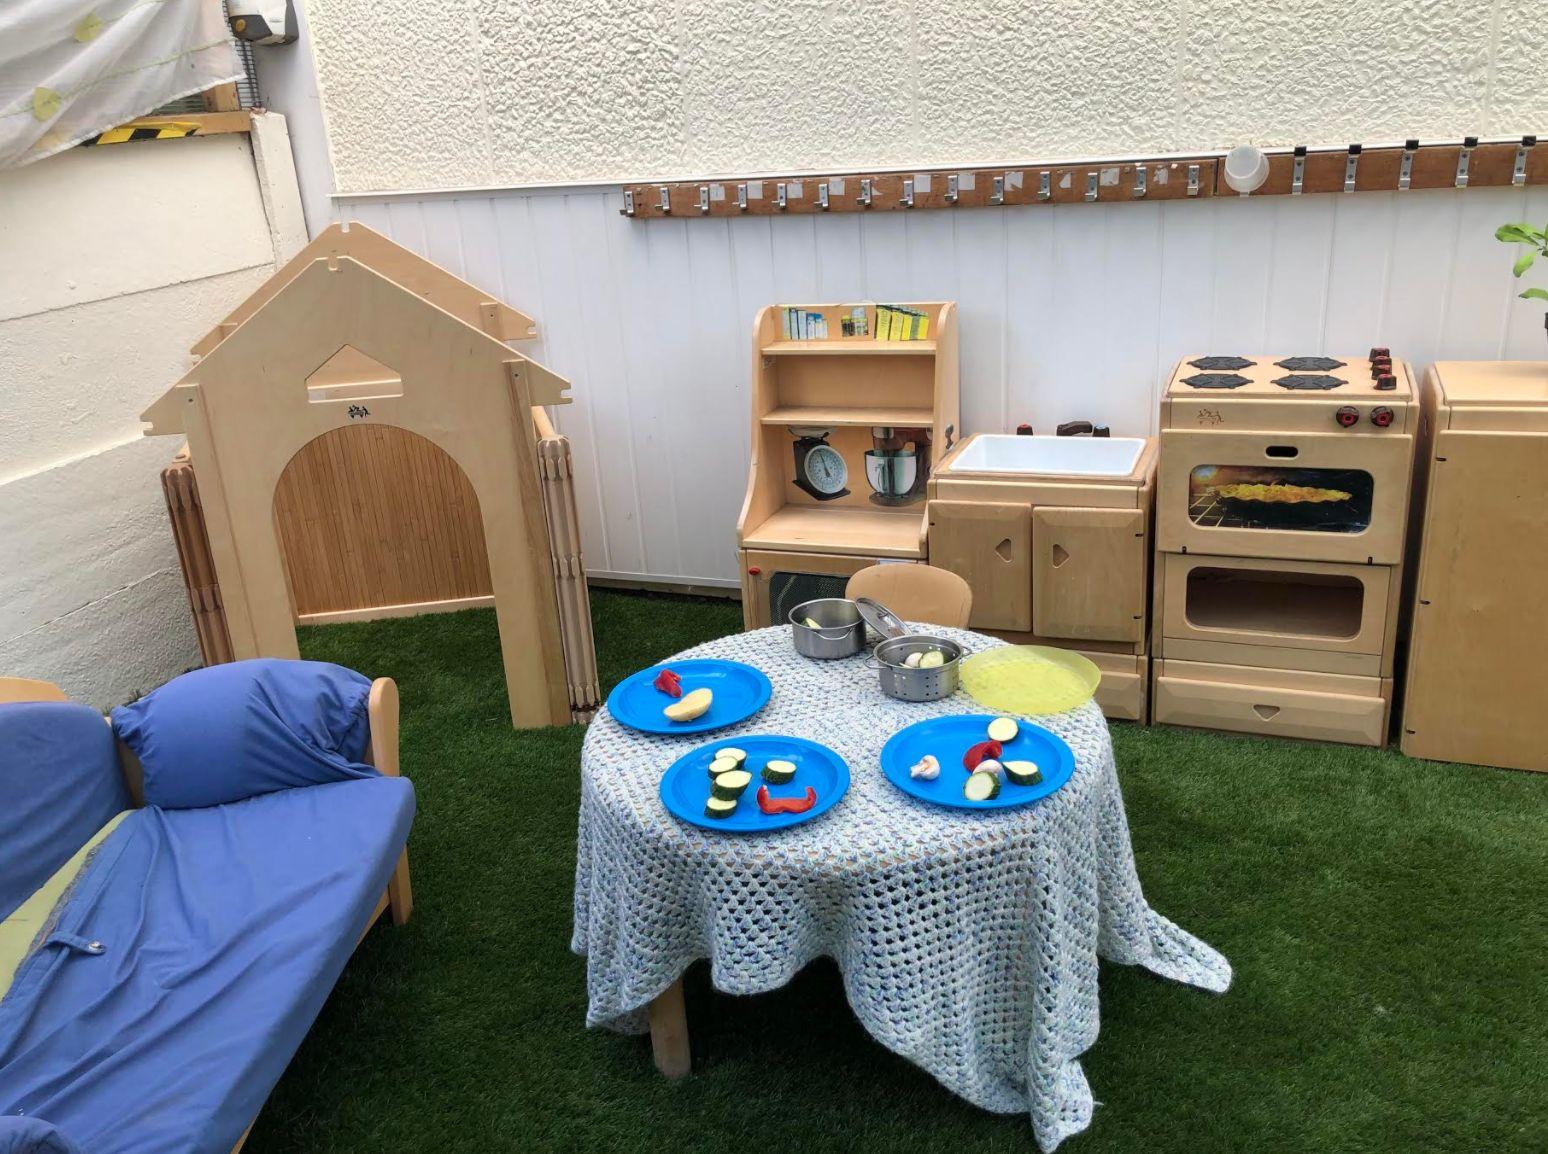 A play kitchen at Eastbury Nursery.